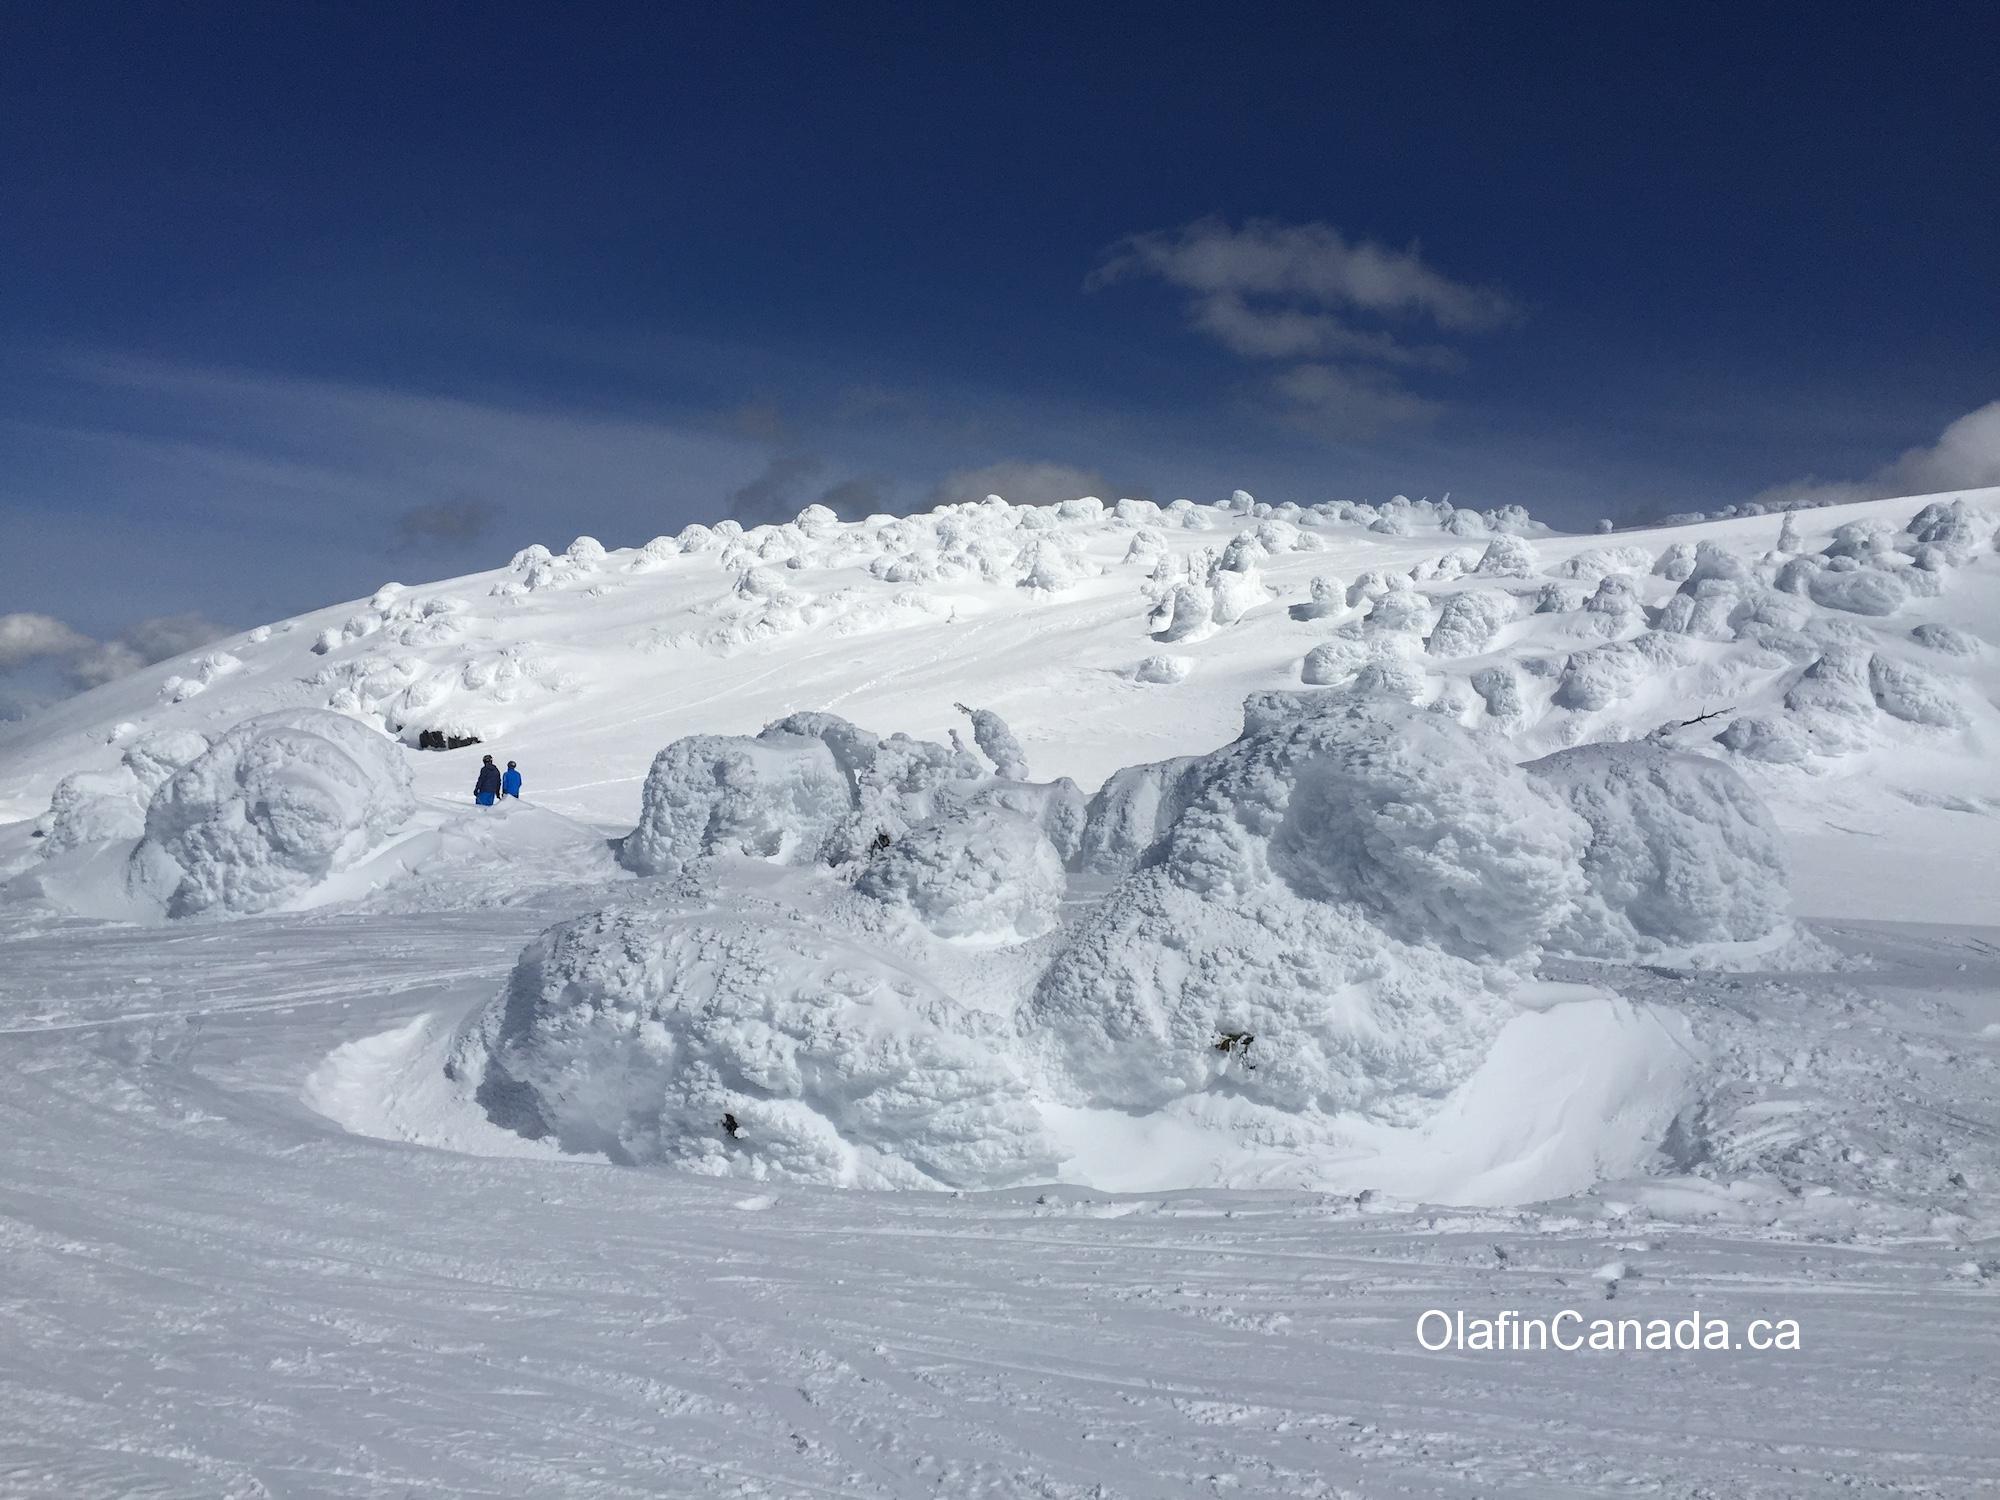 Snow ghosts at Big White in Kelowna #olafincanada #britishcolumbia #discoverbc #bigwhite #kelowna #snowghosts